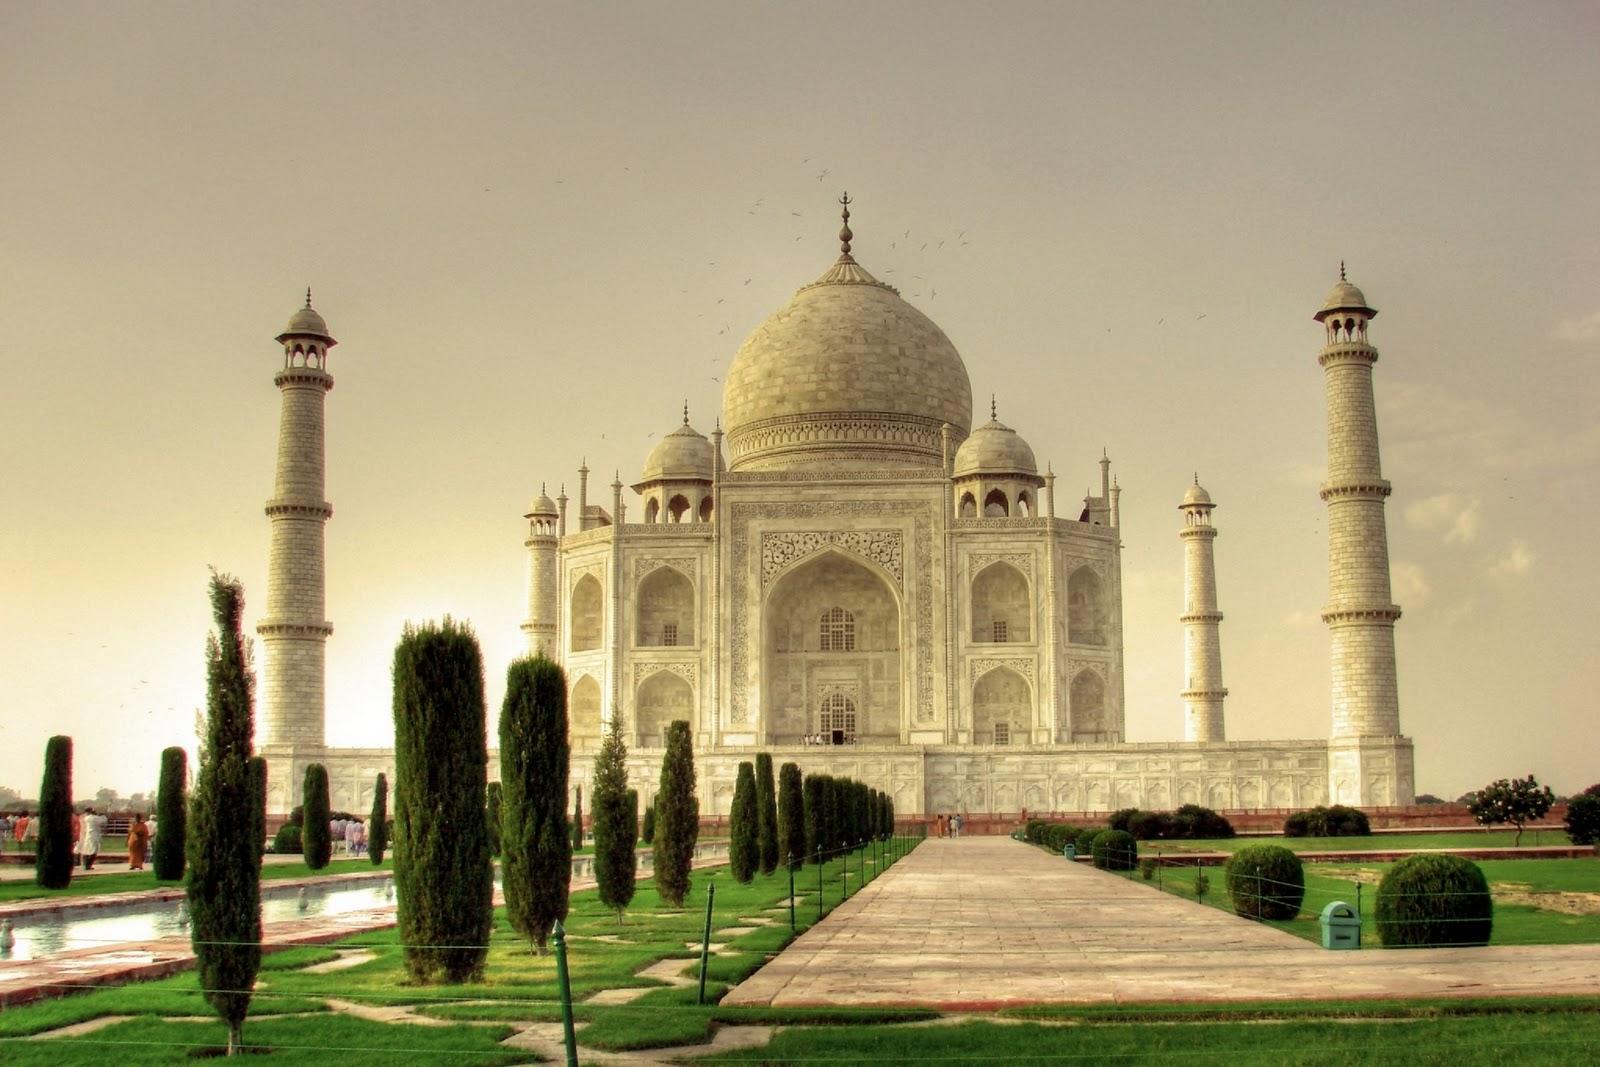 Taj Mahal HD Wallpaper - WallpaperSafari